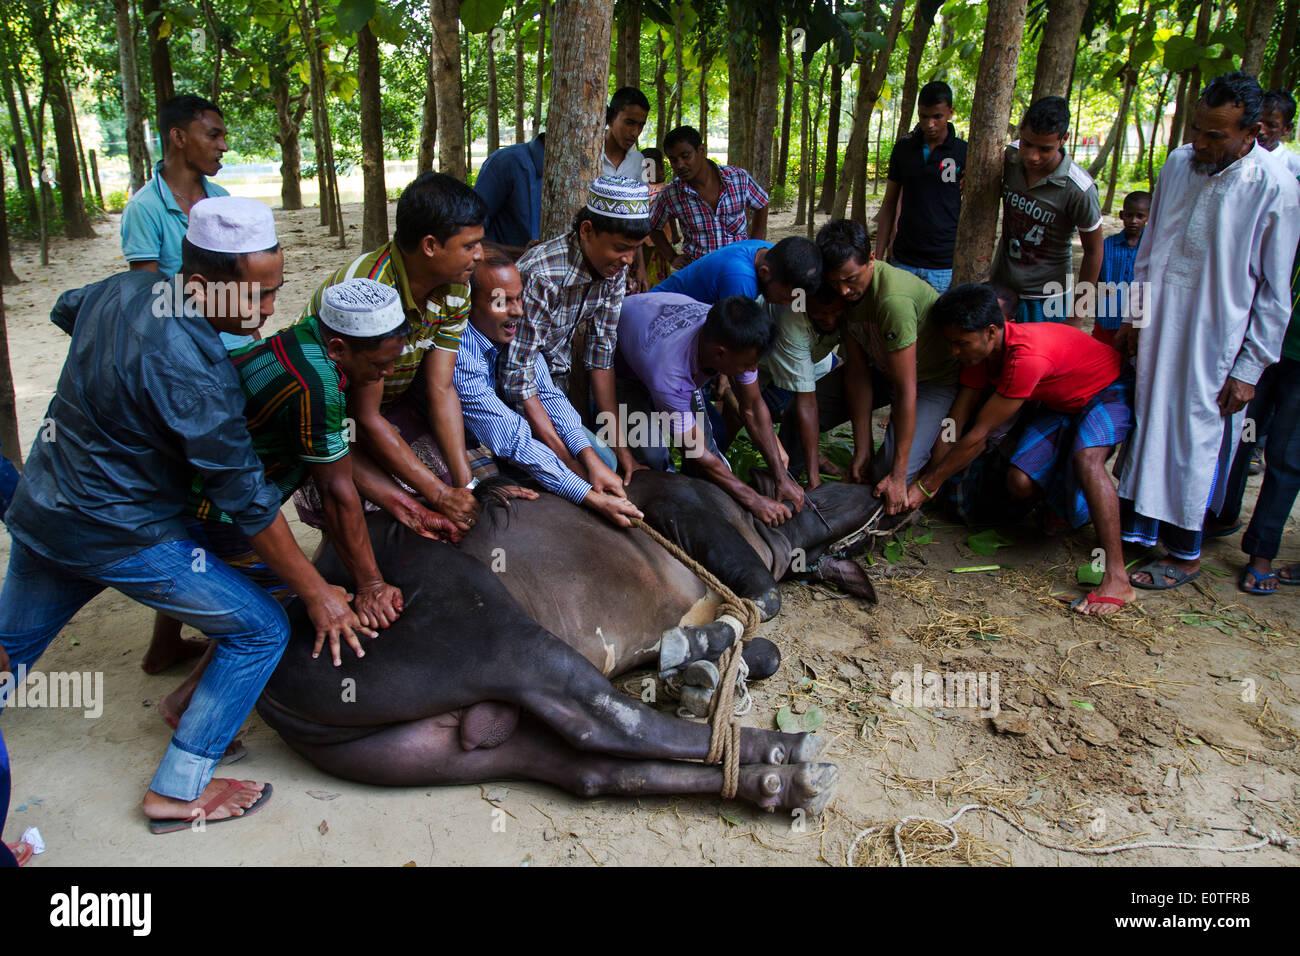 Feast of sacrifice in Feni Bangladesh - Stock Image